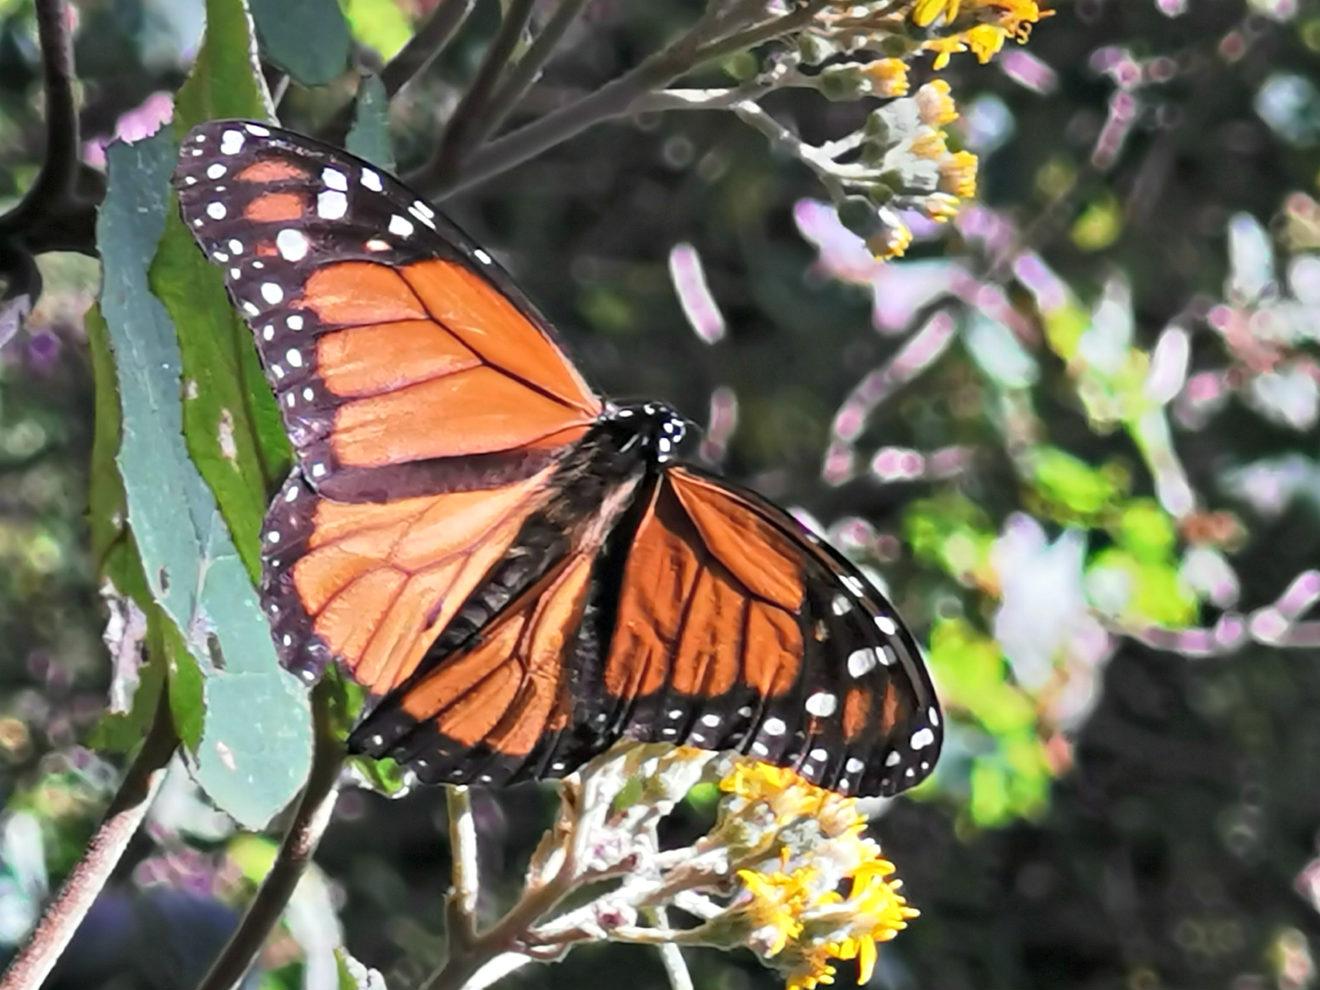 Motyl Monarcha w Meksyku na kwiatku